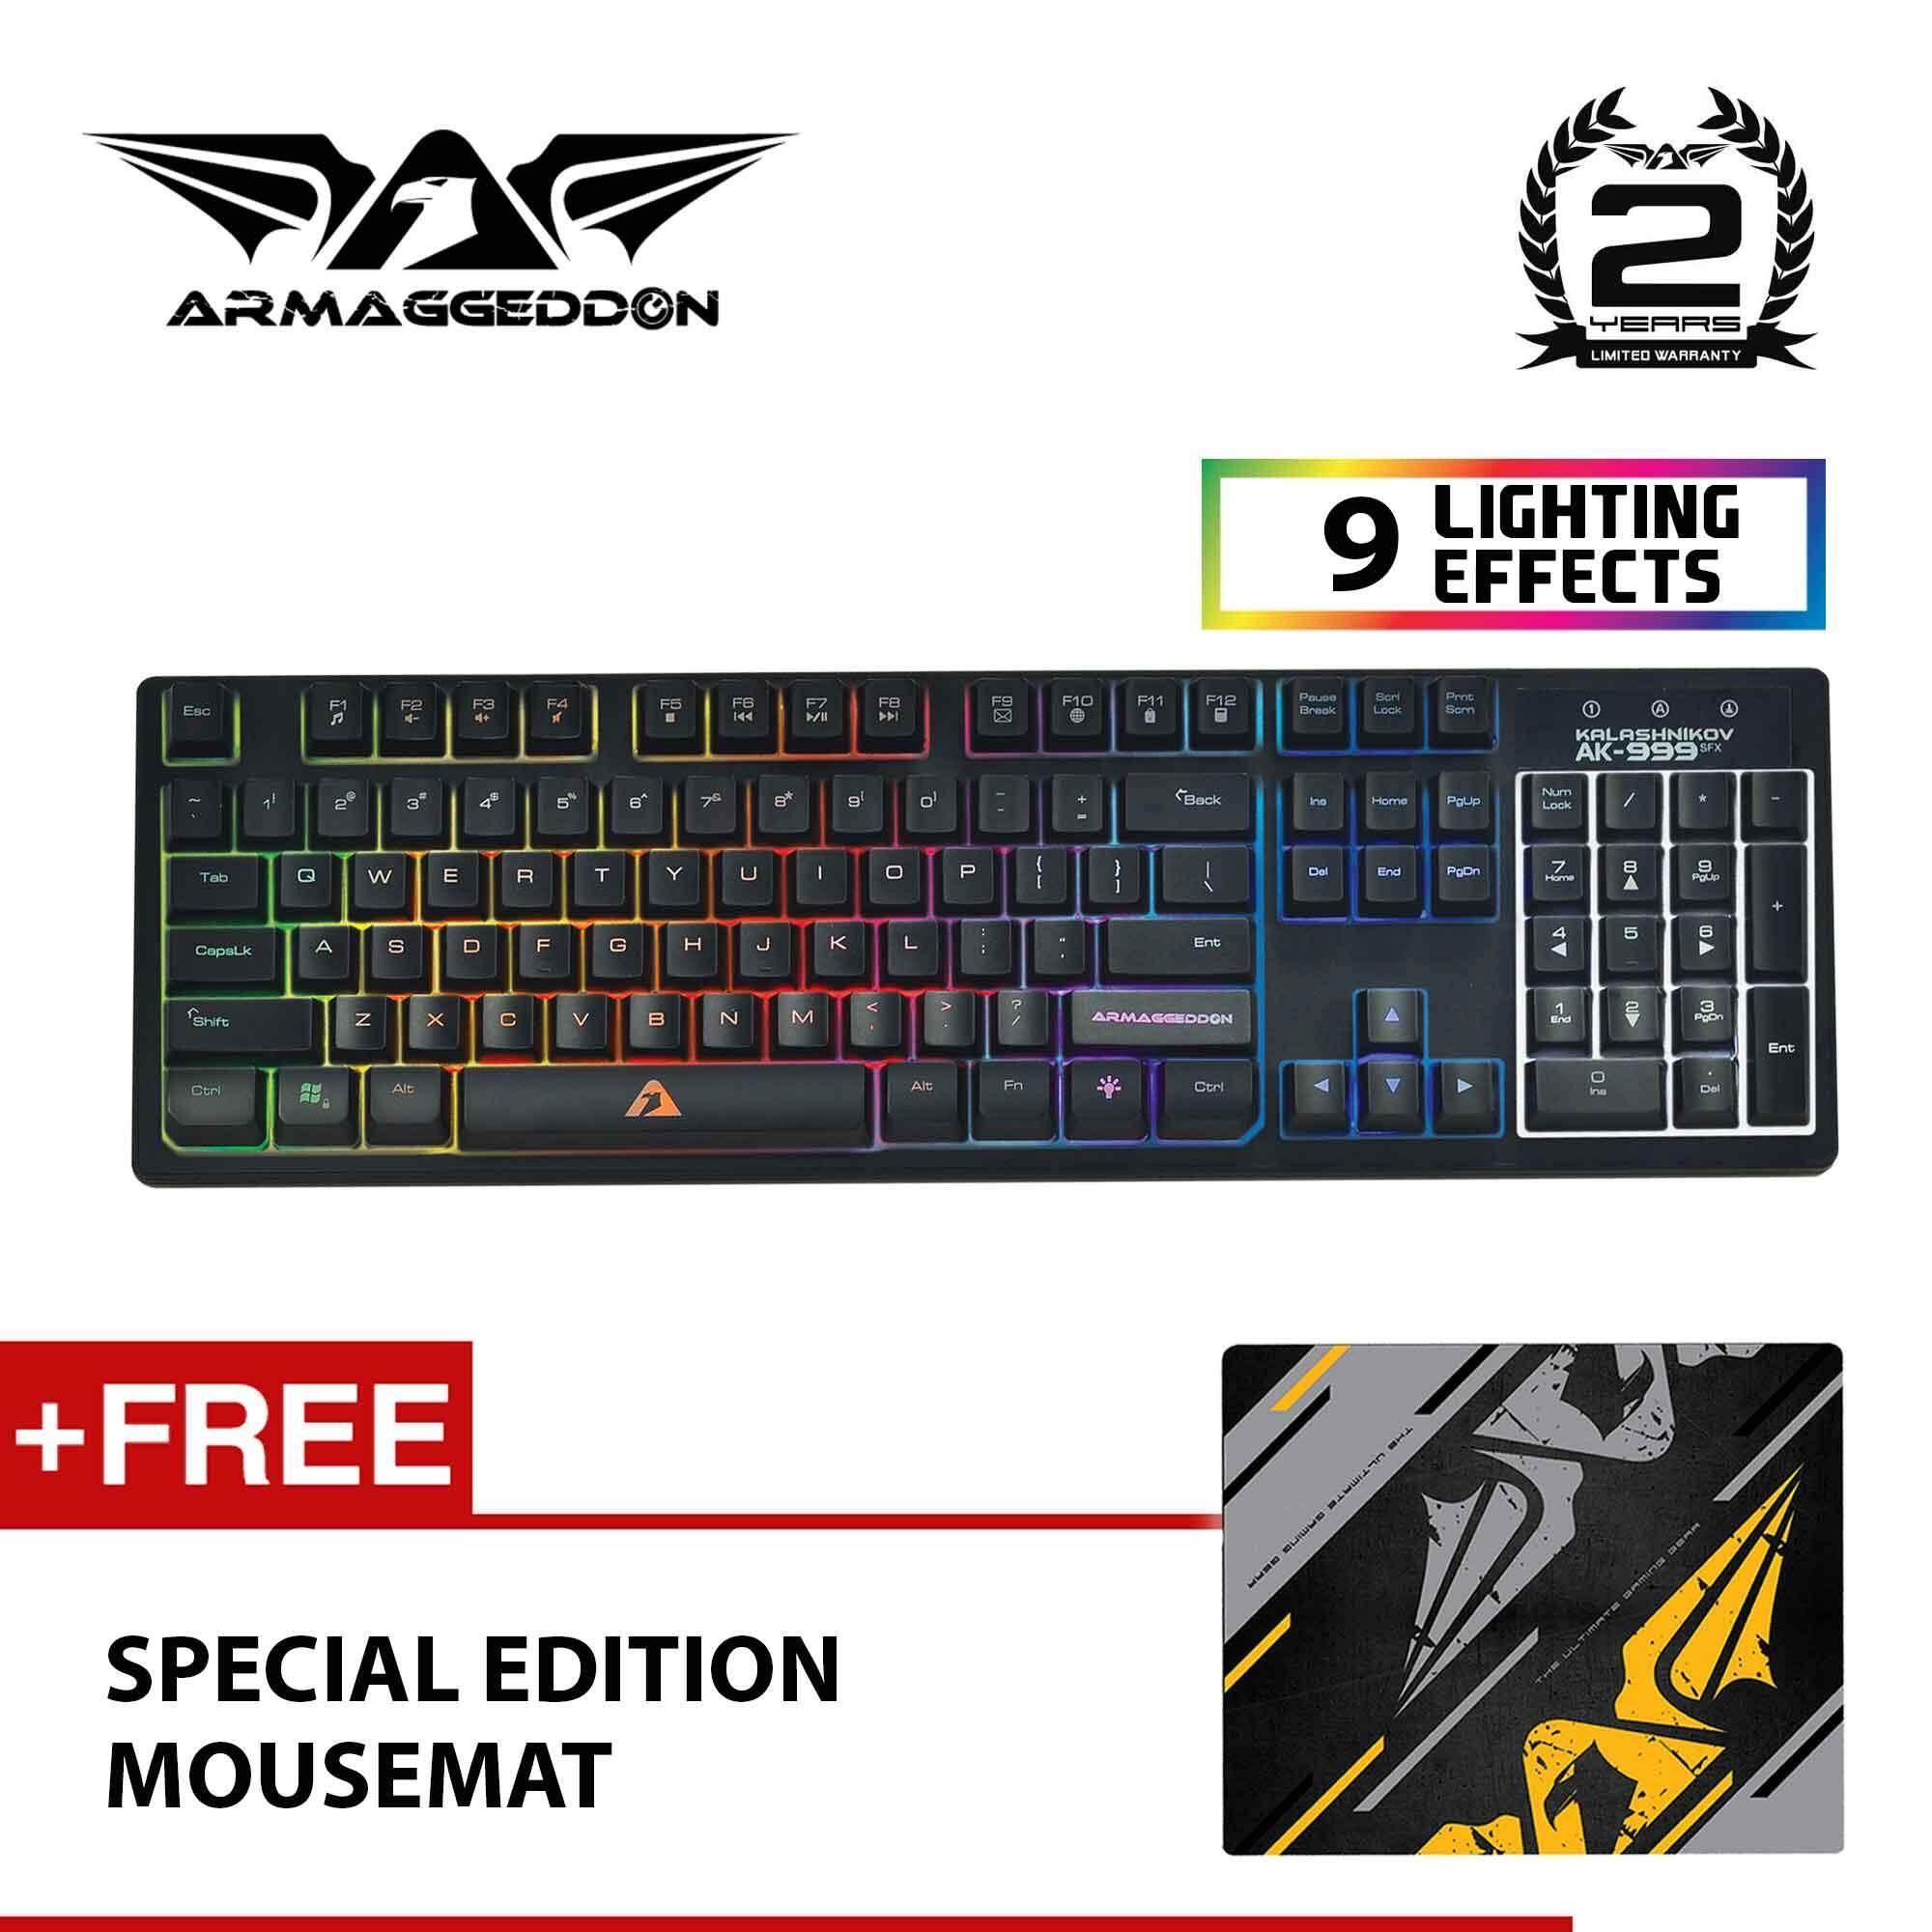 Sell Mechanical Keyboard K550w Cheapest Best Quality My Store Armaggeddon Gaming Mka 3c Psychfalcon Myr 59